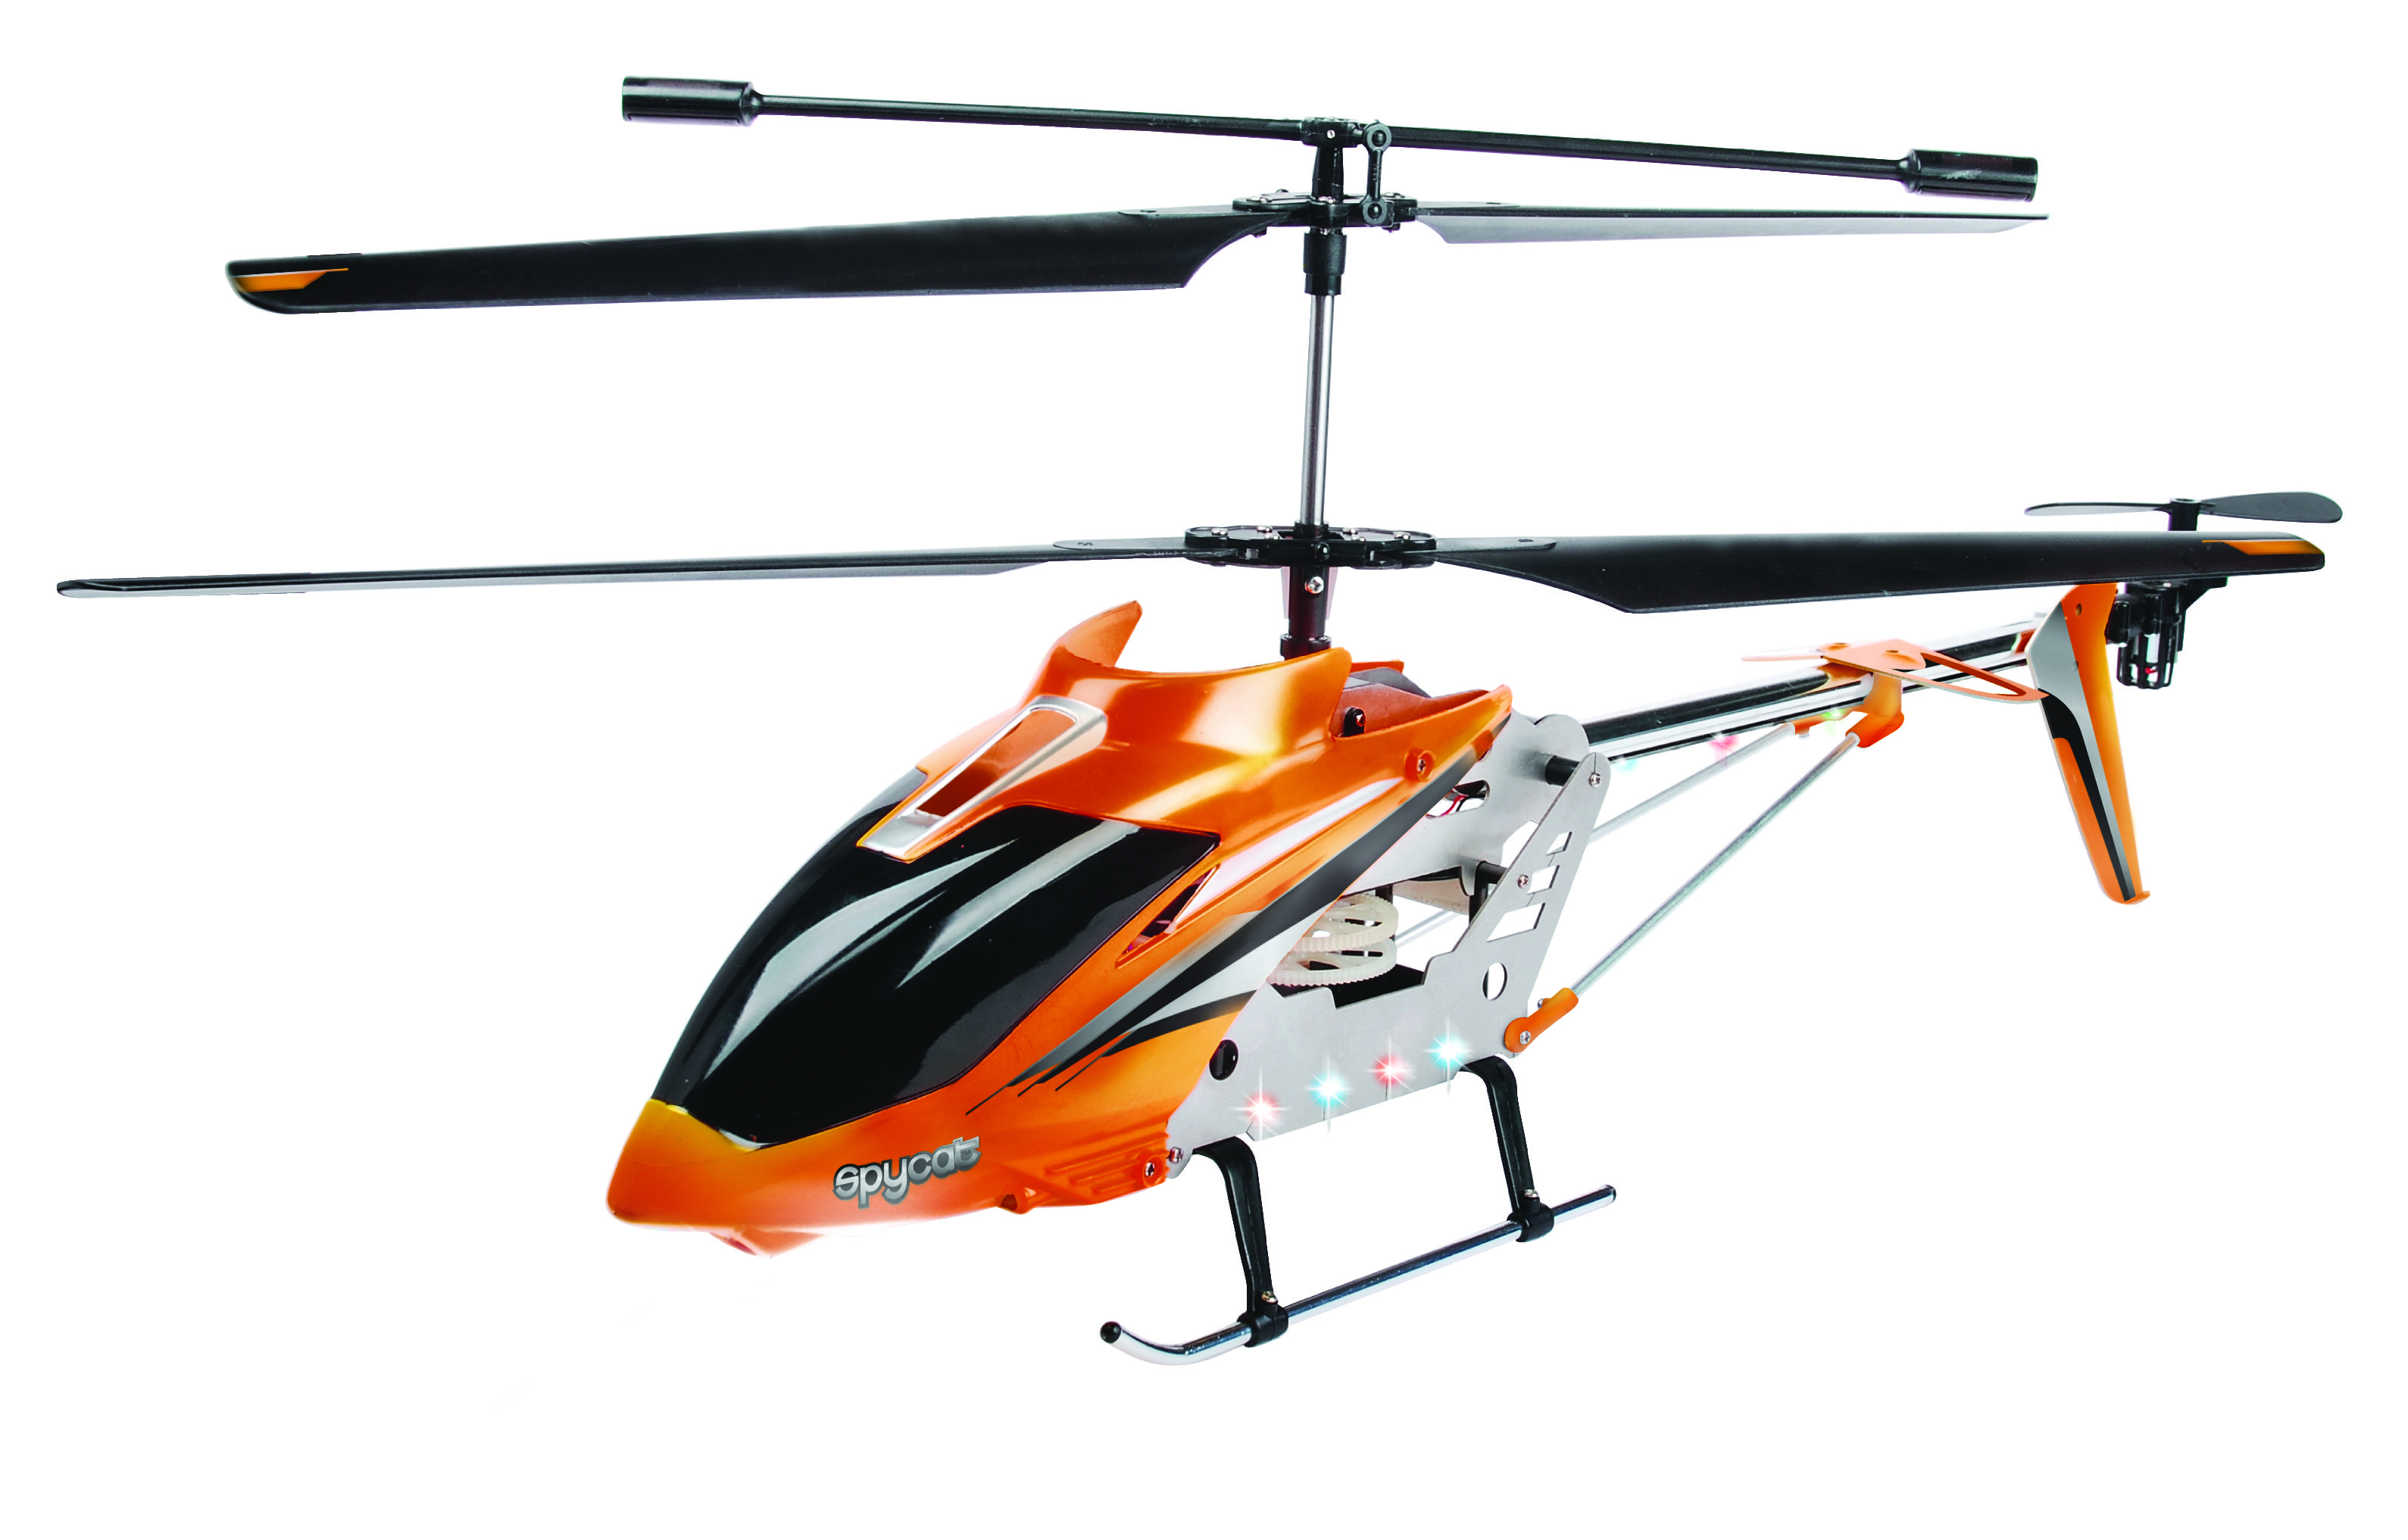 spycat-21inch-model2-metallic-orange-rev-flat